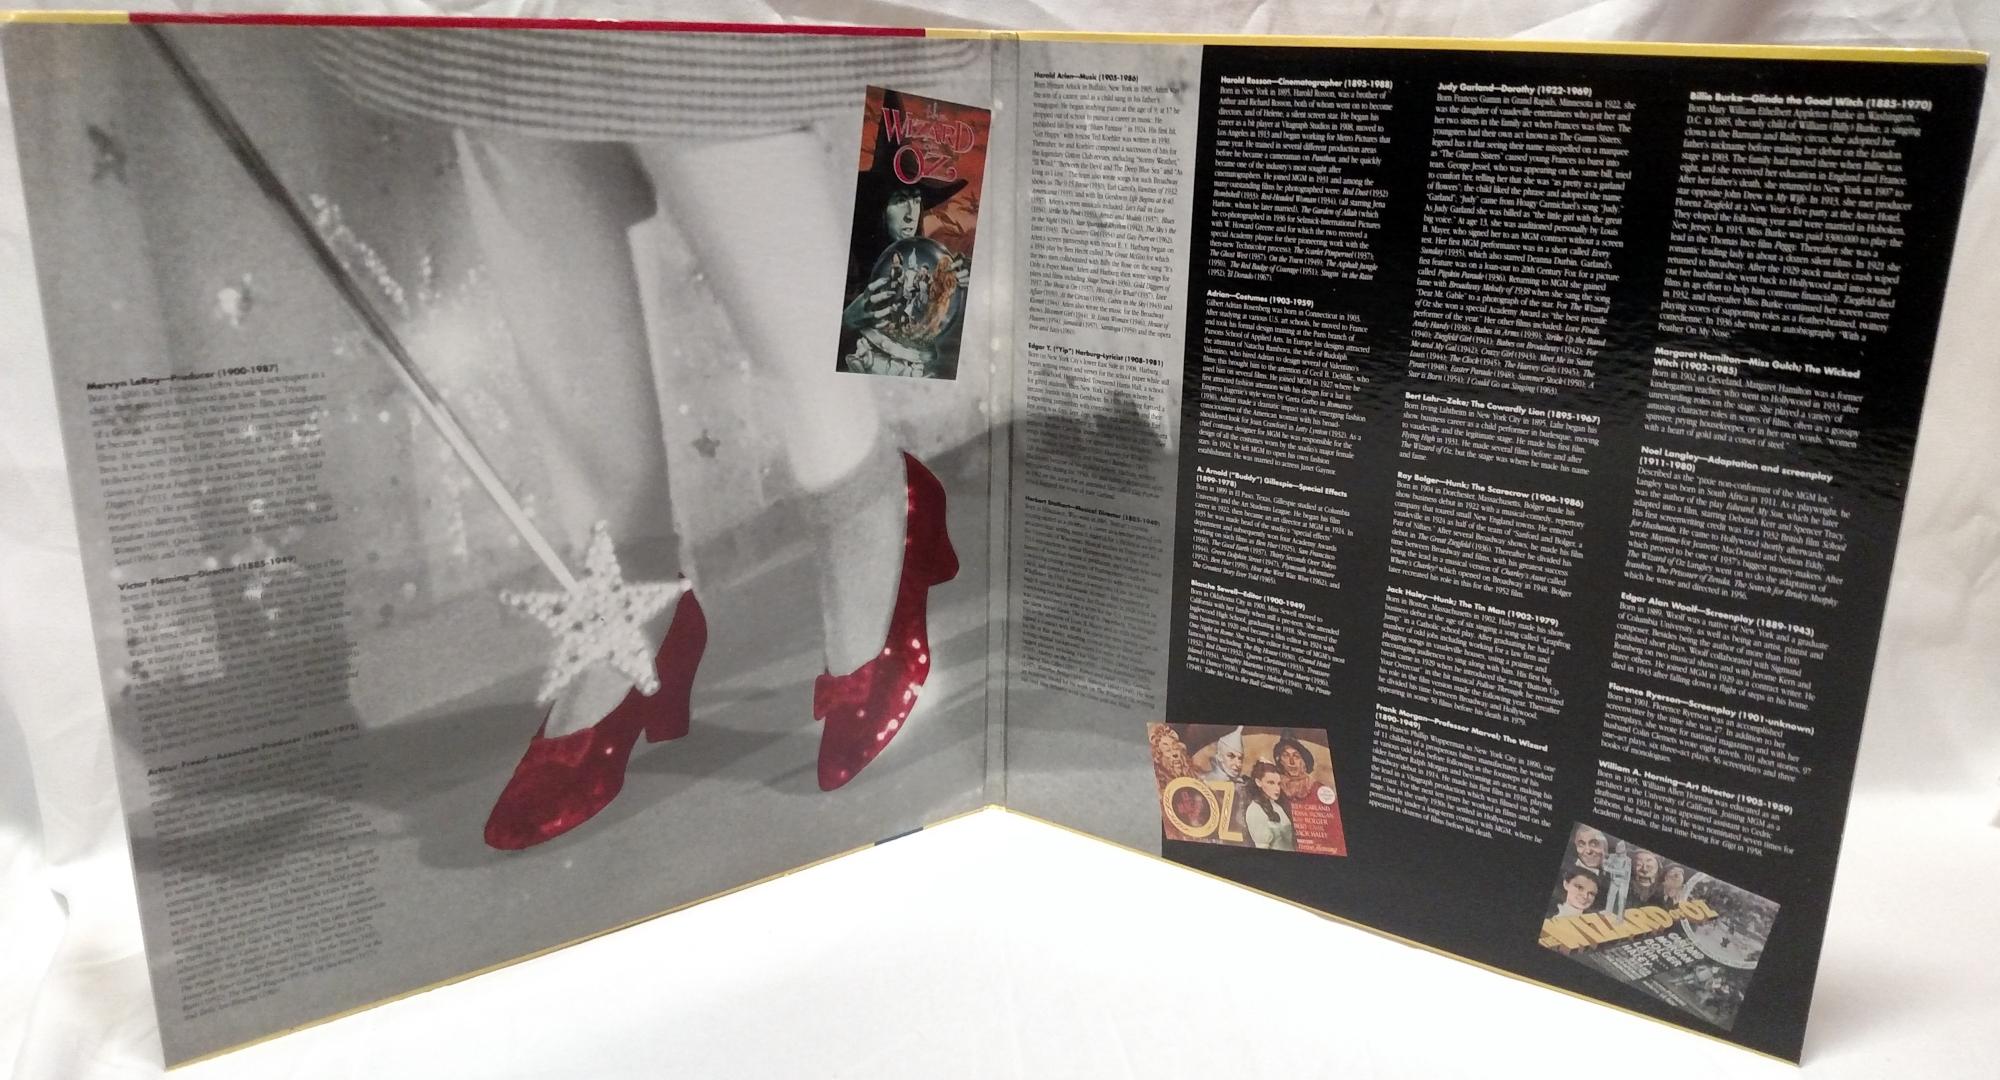 The Wizard of Oz - 1988 Criterion Laserdisc Interior Gatefold